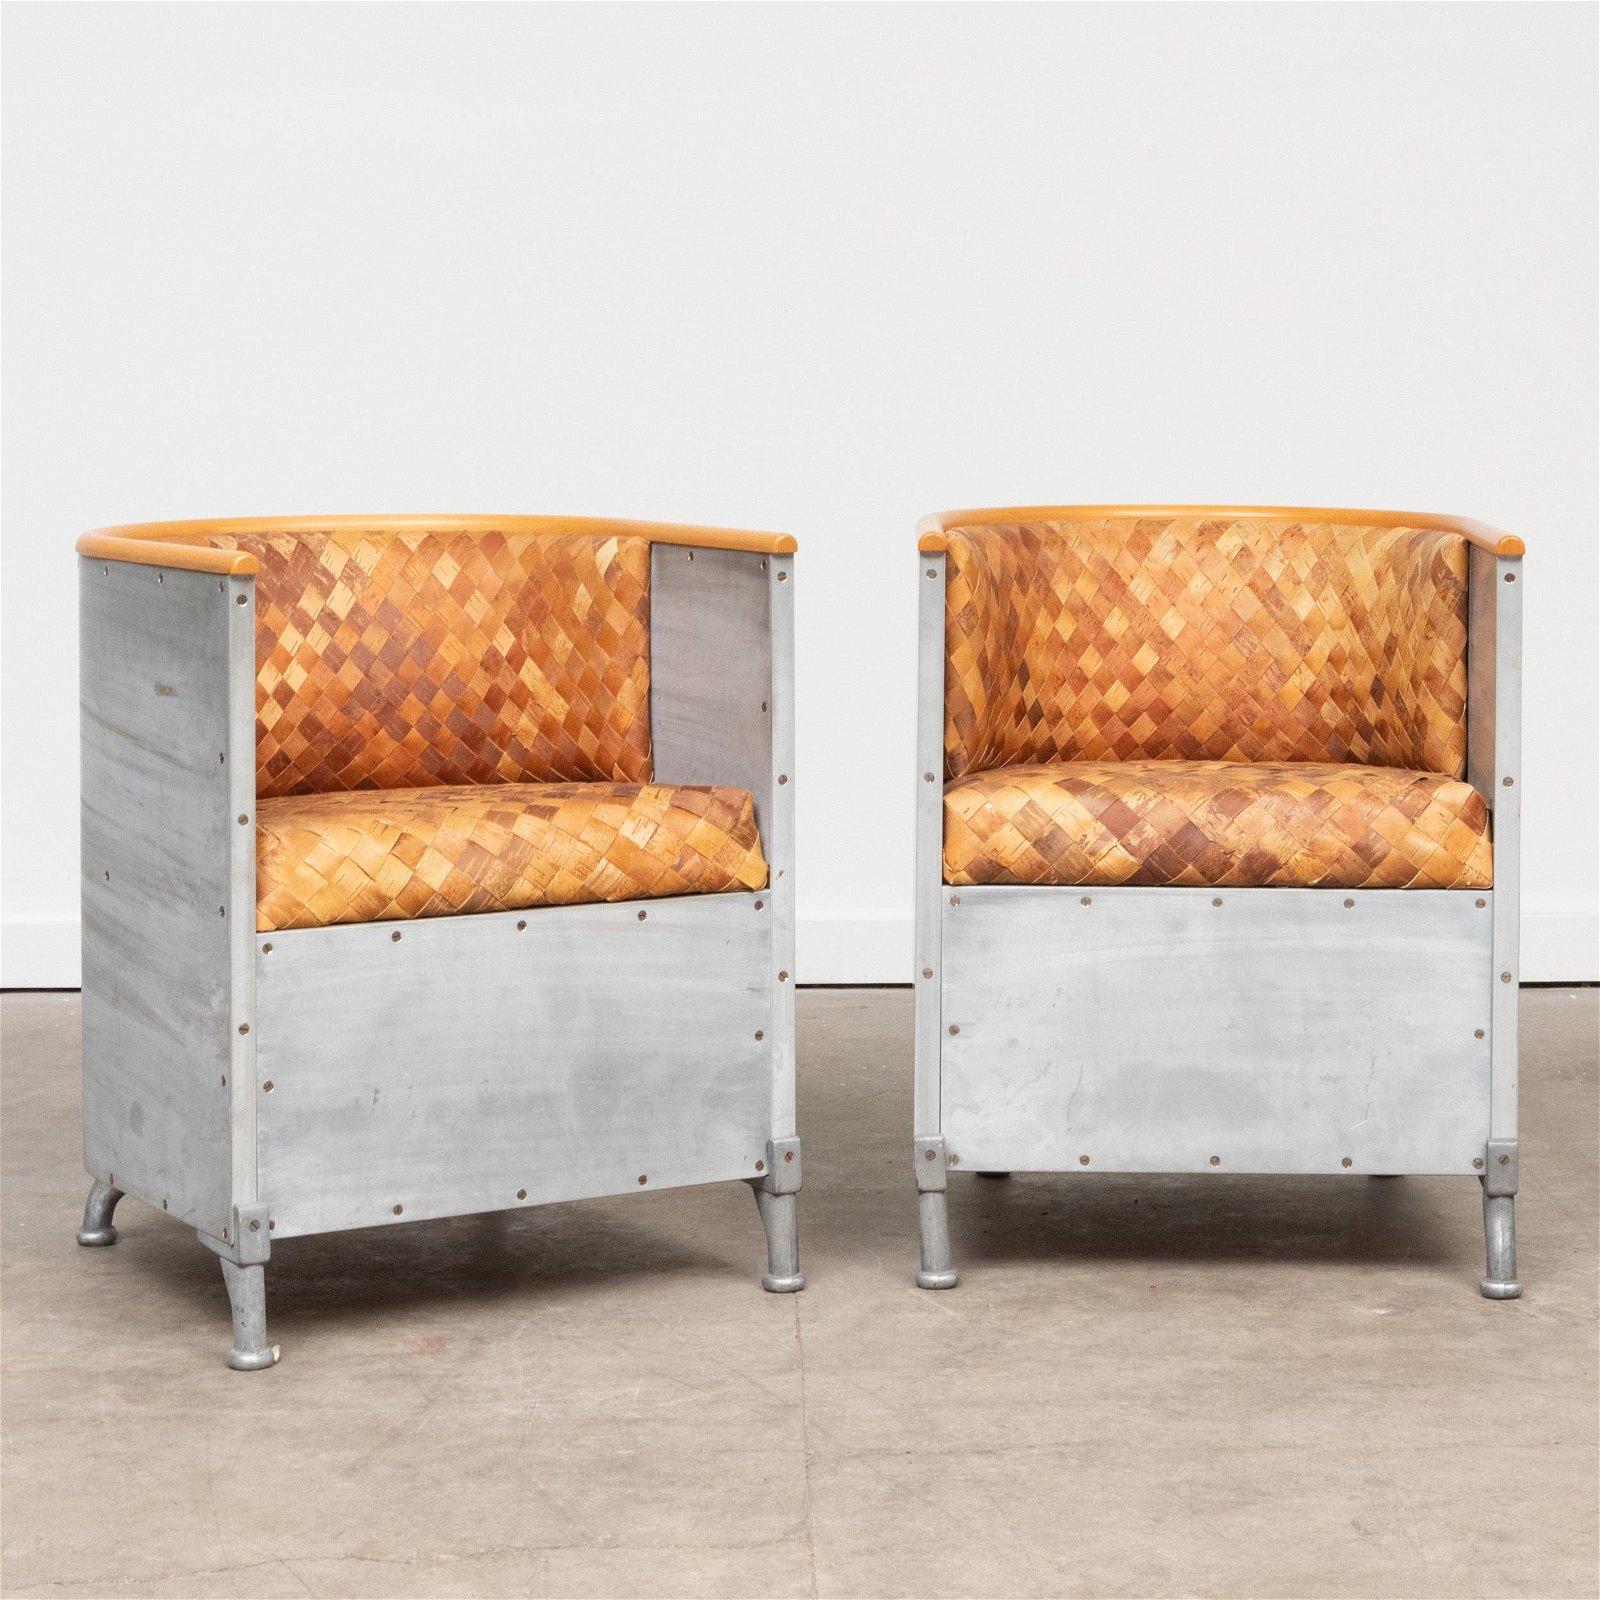 Two Mats Theselius Aluminum and Woven Wood 'Fatolj'